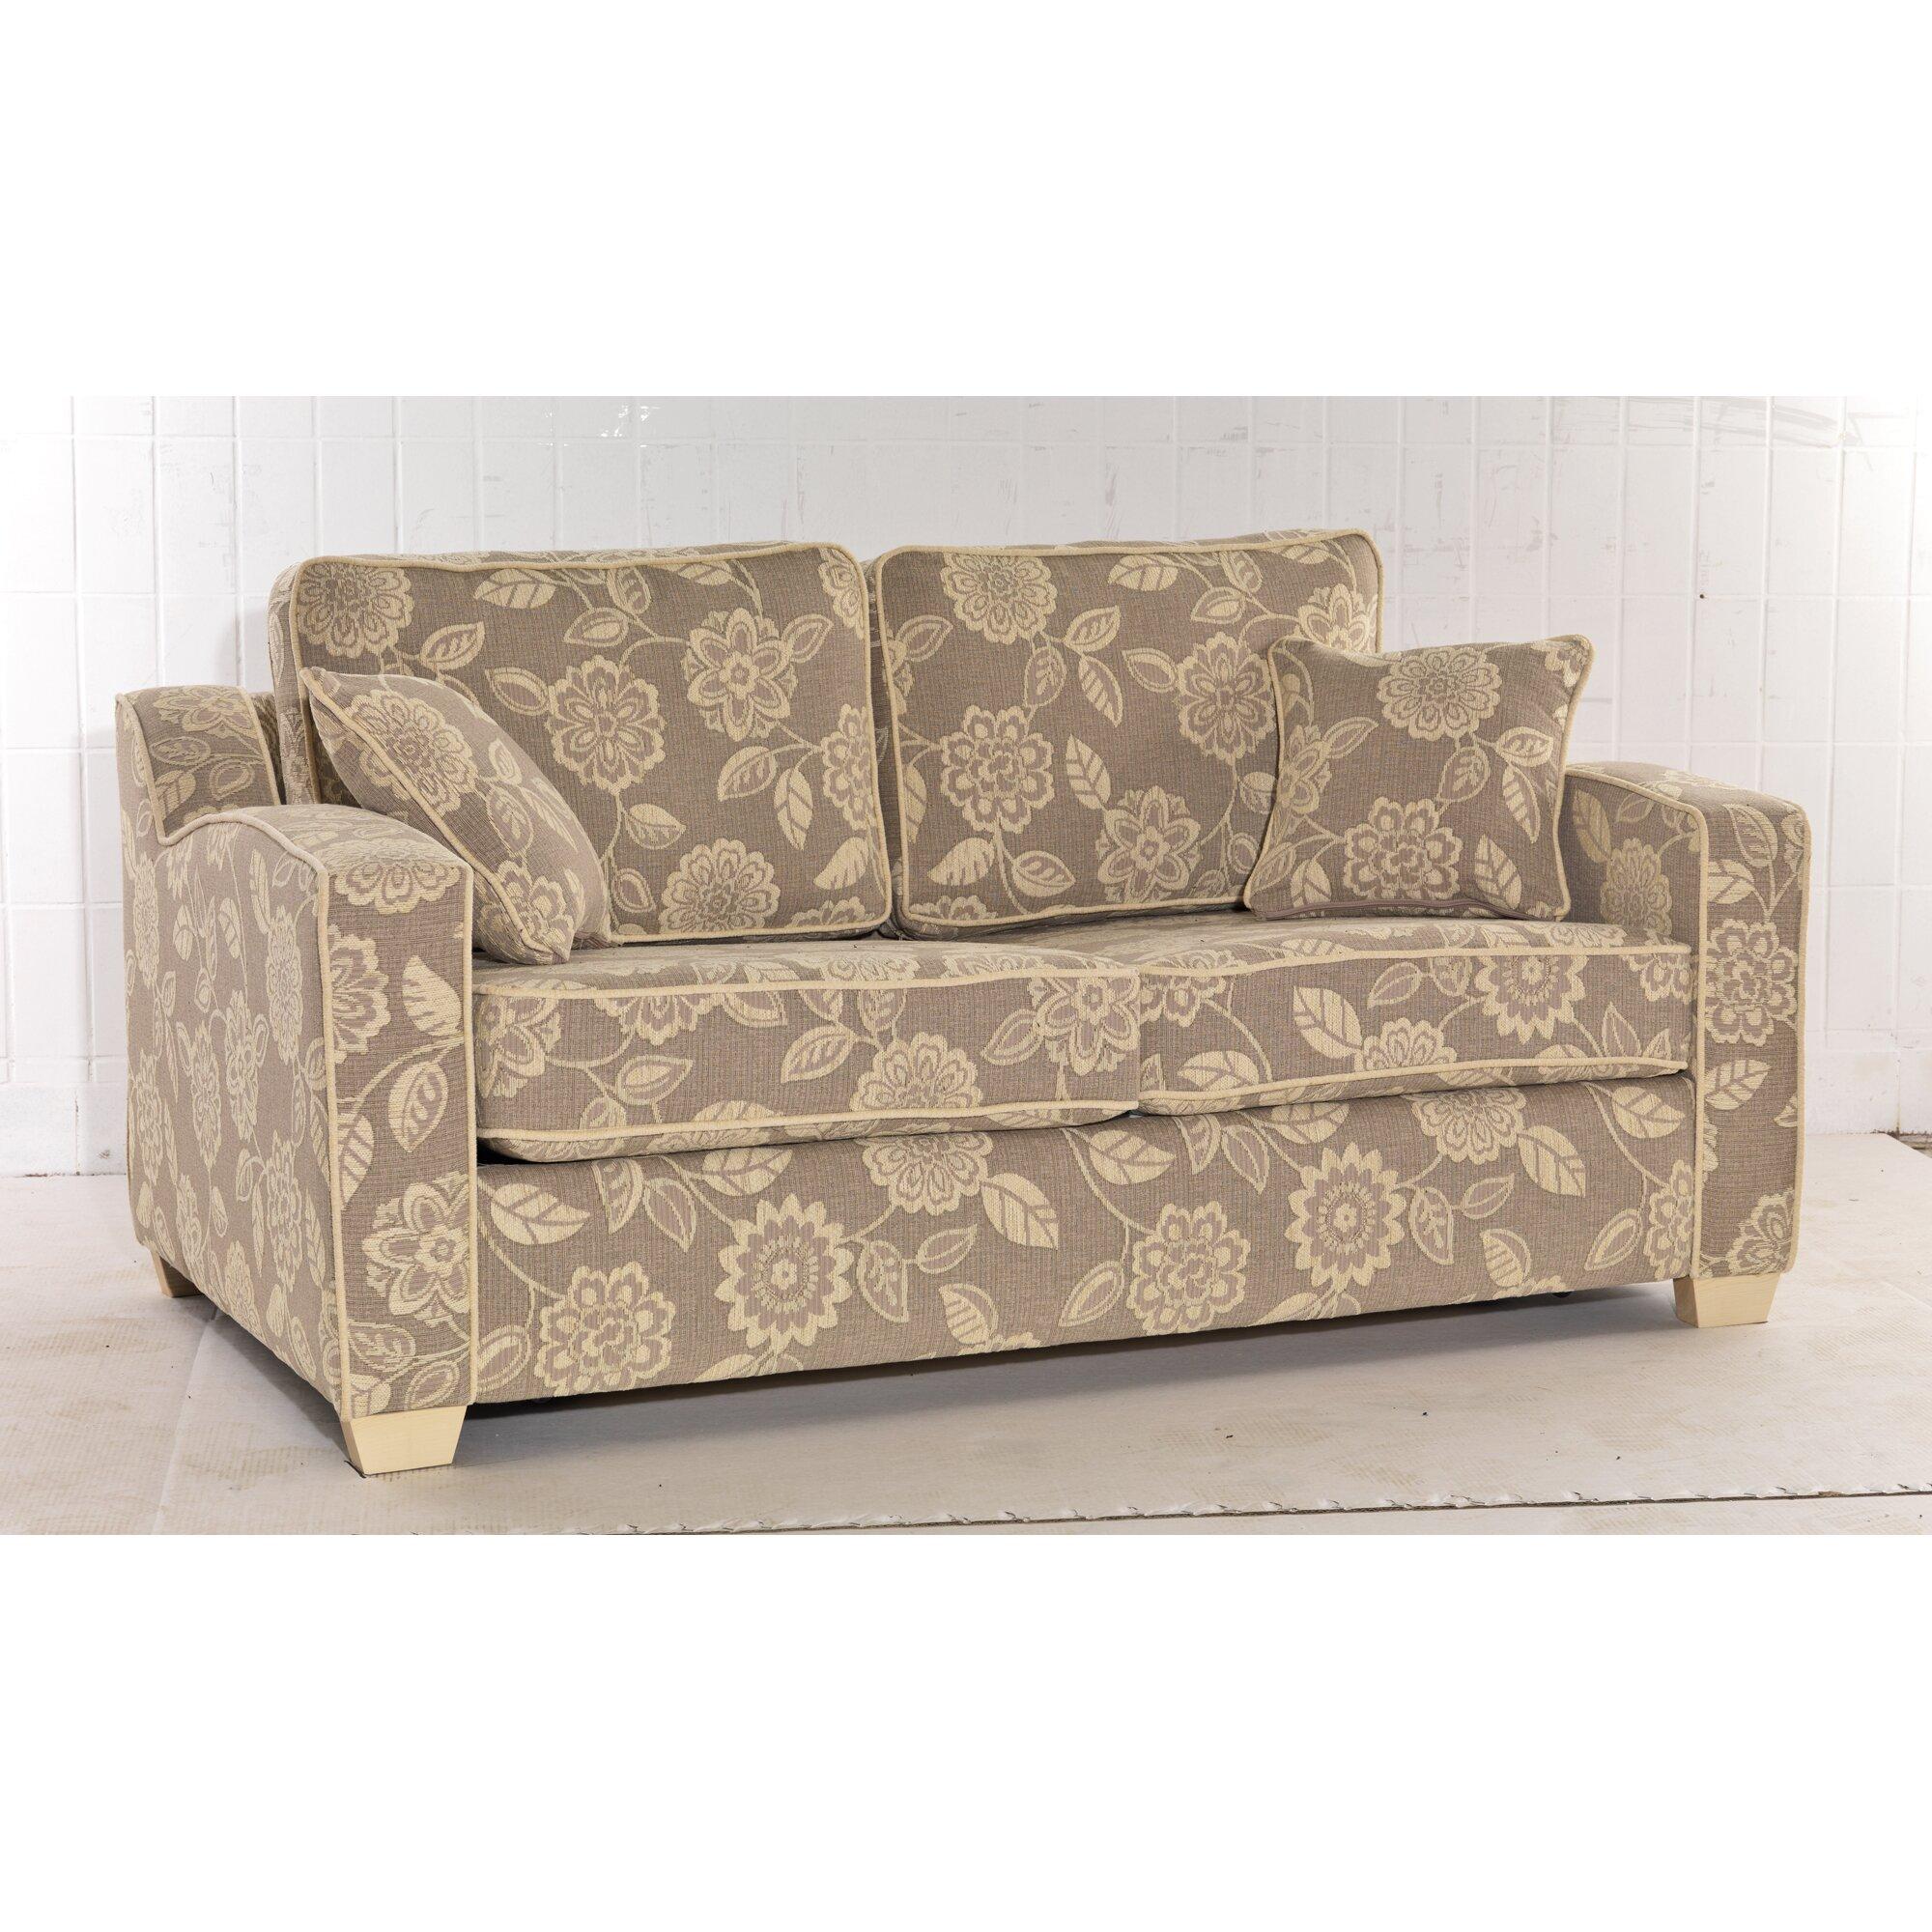 berlin 3 seater fold out sofa wayfair uk. Black Bedroom Furniture Sets. Home Design Ideas